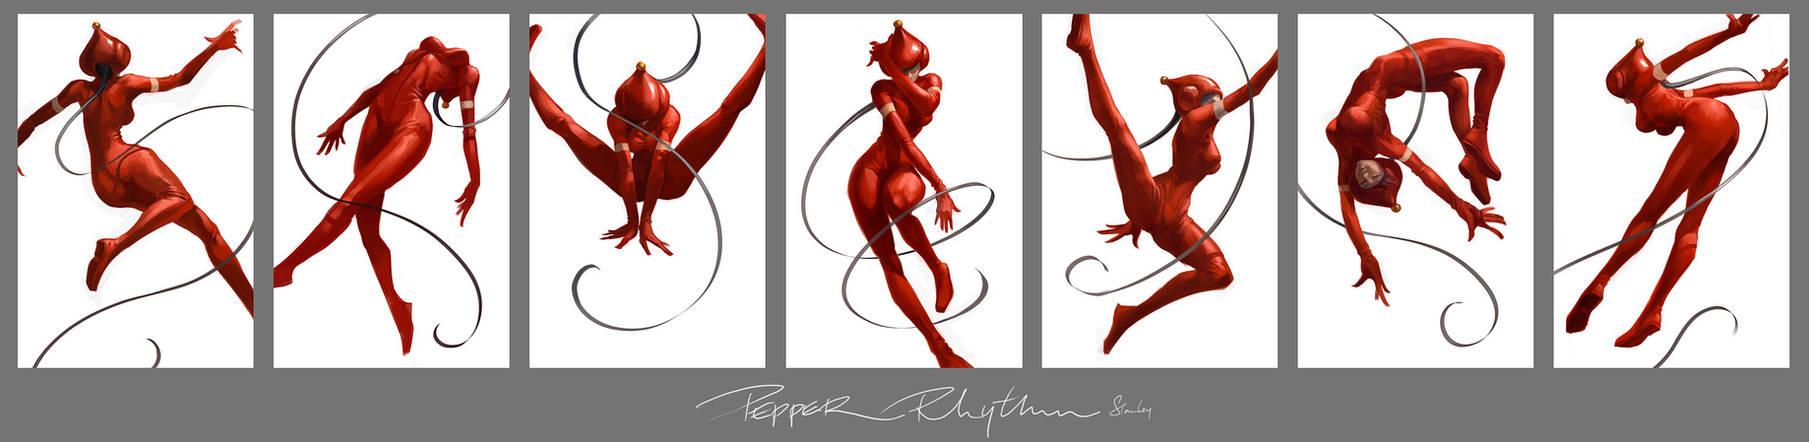 Pepper Rhythm